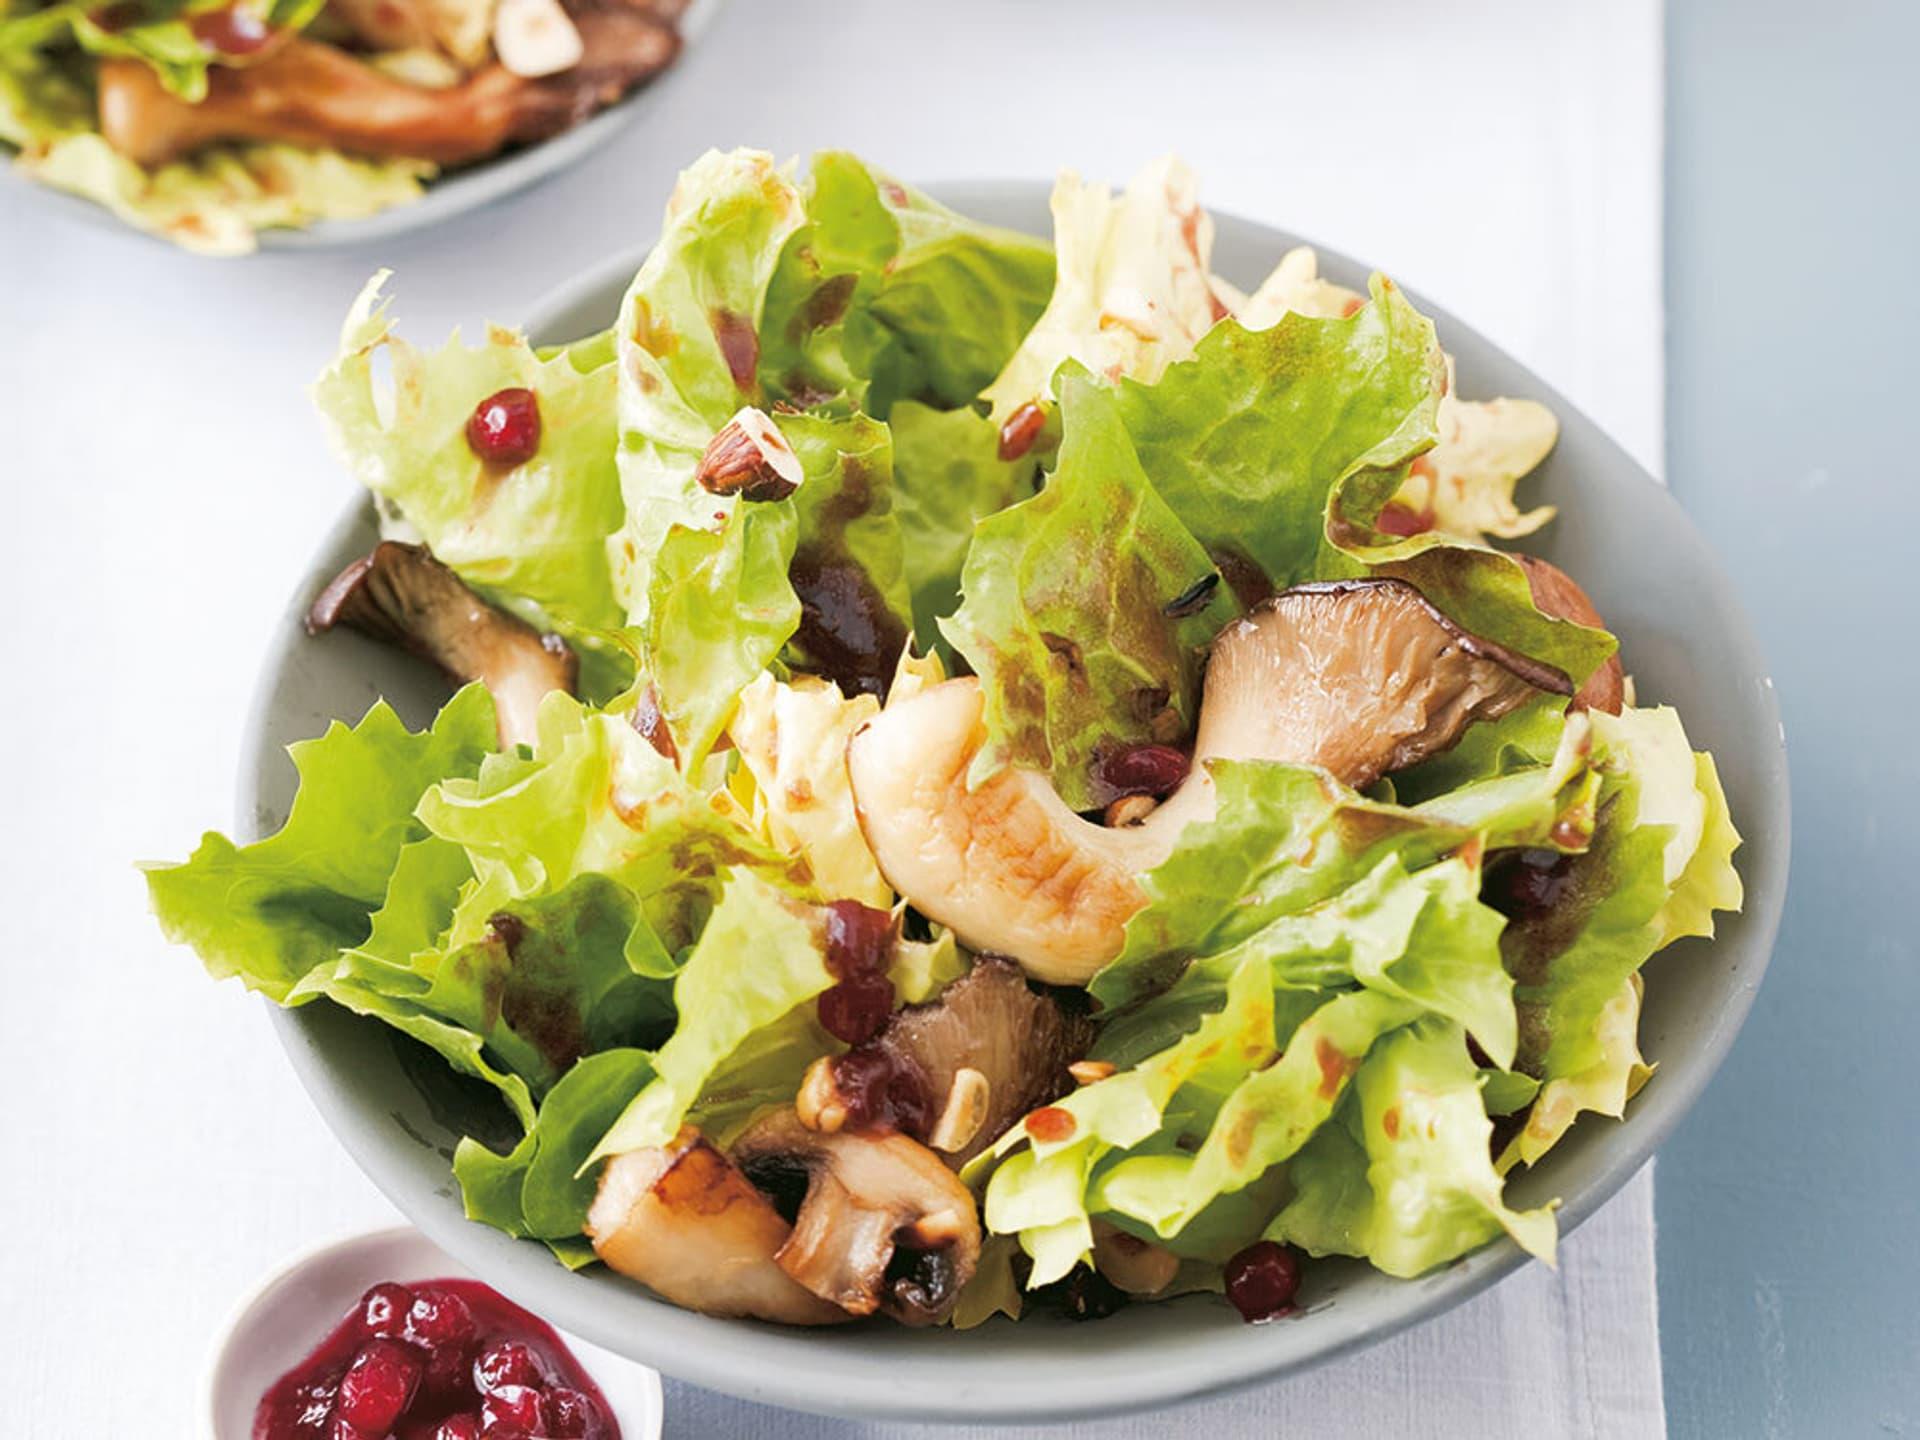 Endivien pilz salat